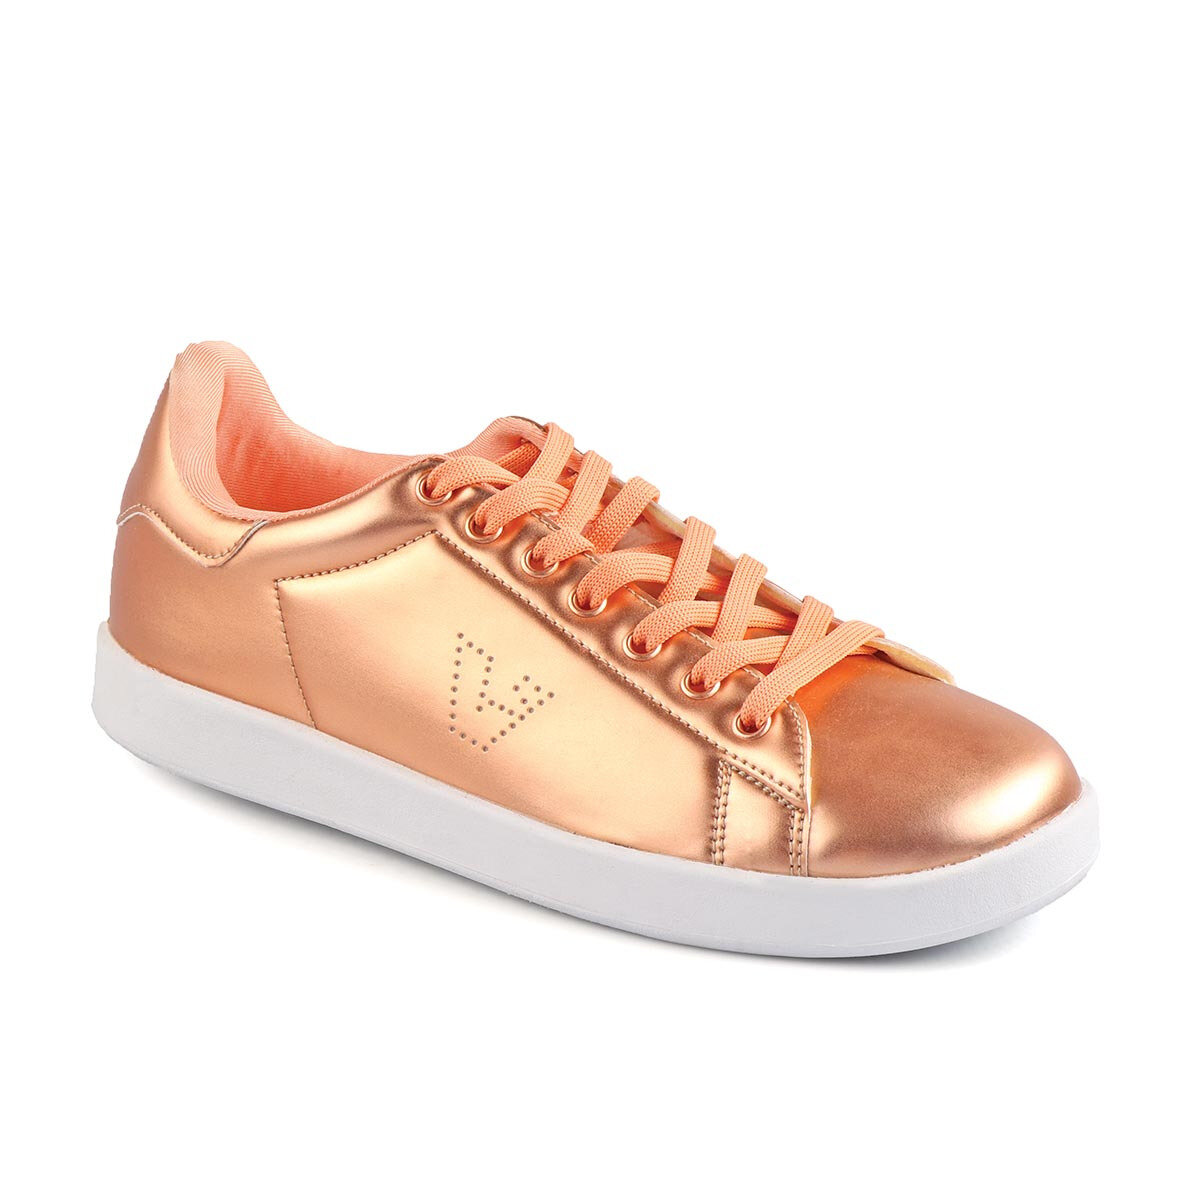 FLO 313. G19K. 201 G SPORTS Bronze Female Child Sneaker Shoes VICCO